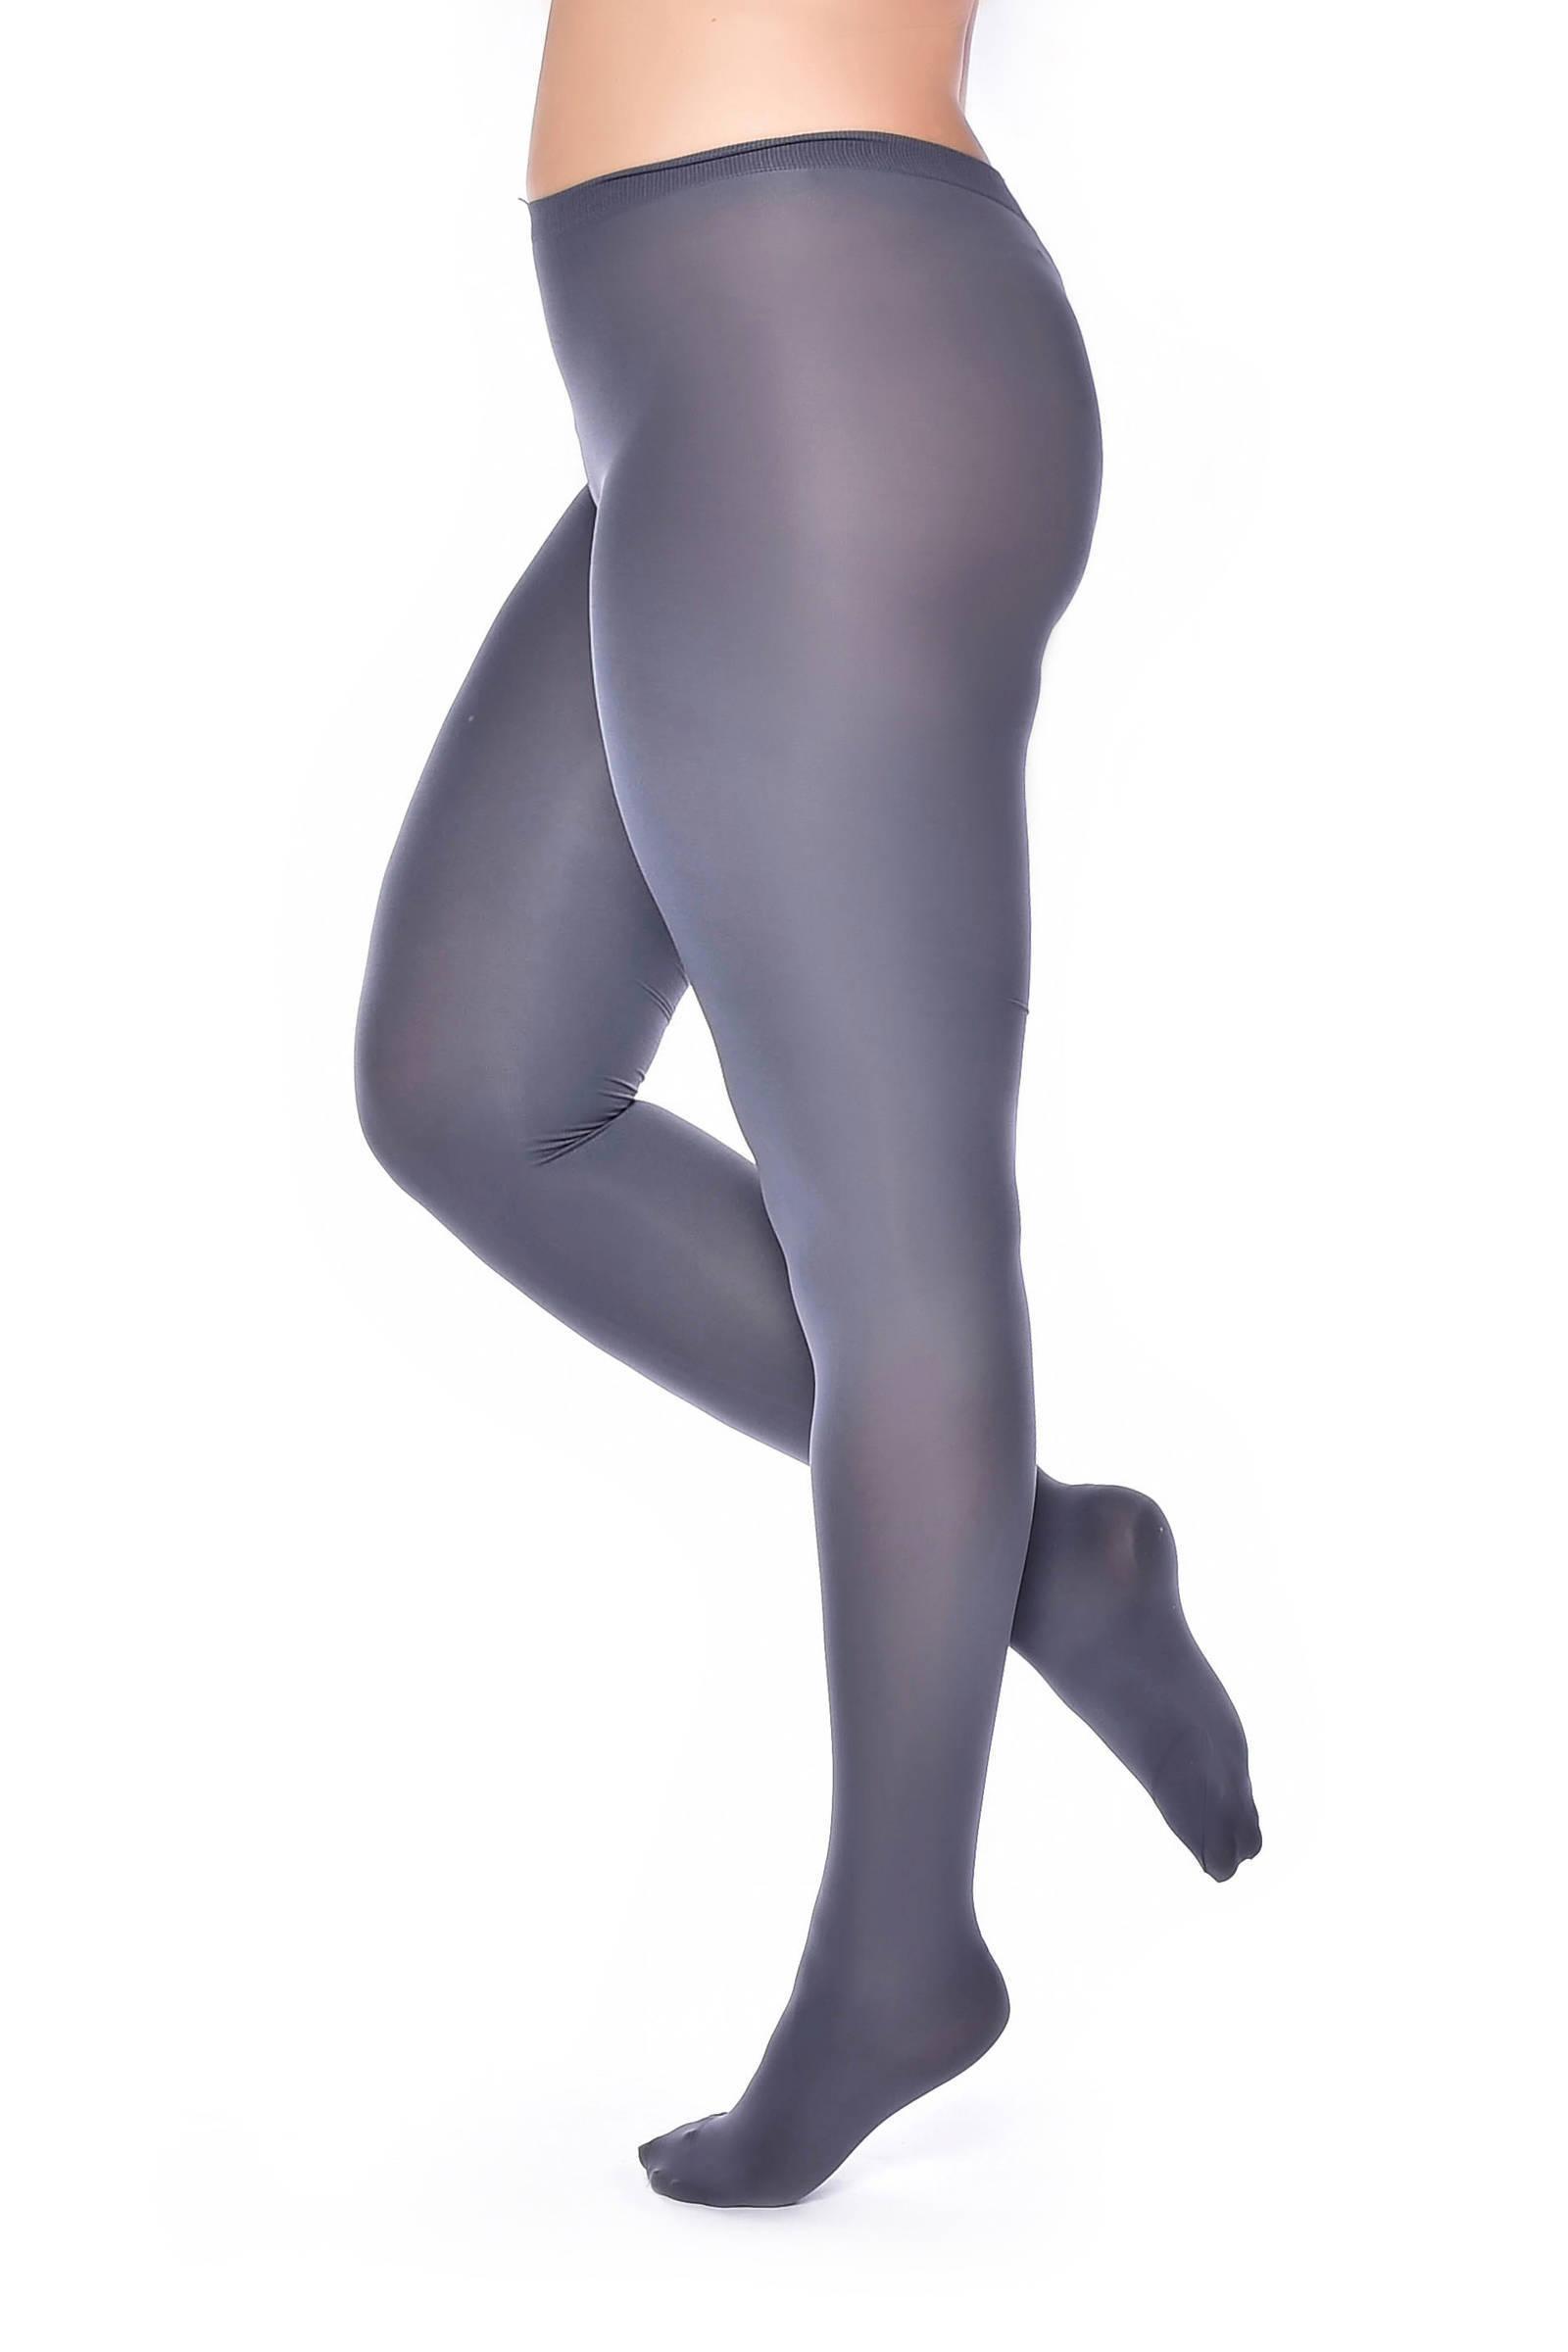 stretch super curvy panty denier 90 Mann Pamela size super IOw5qEf5x